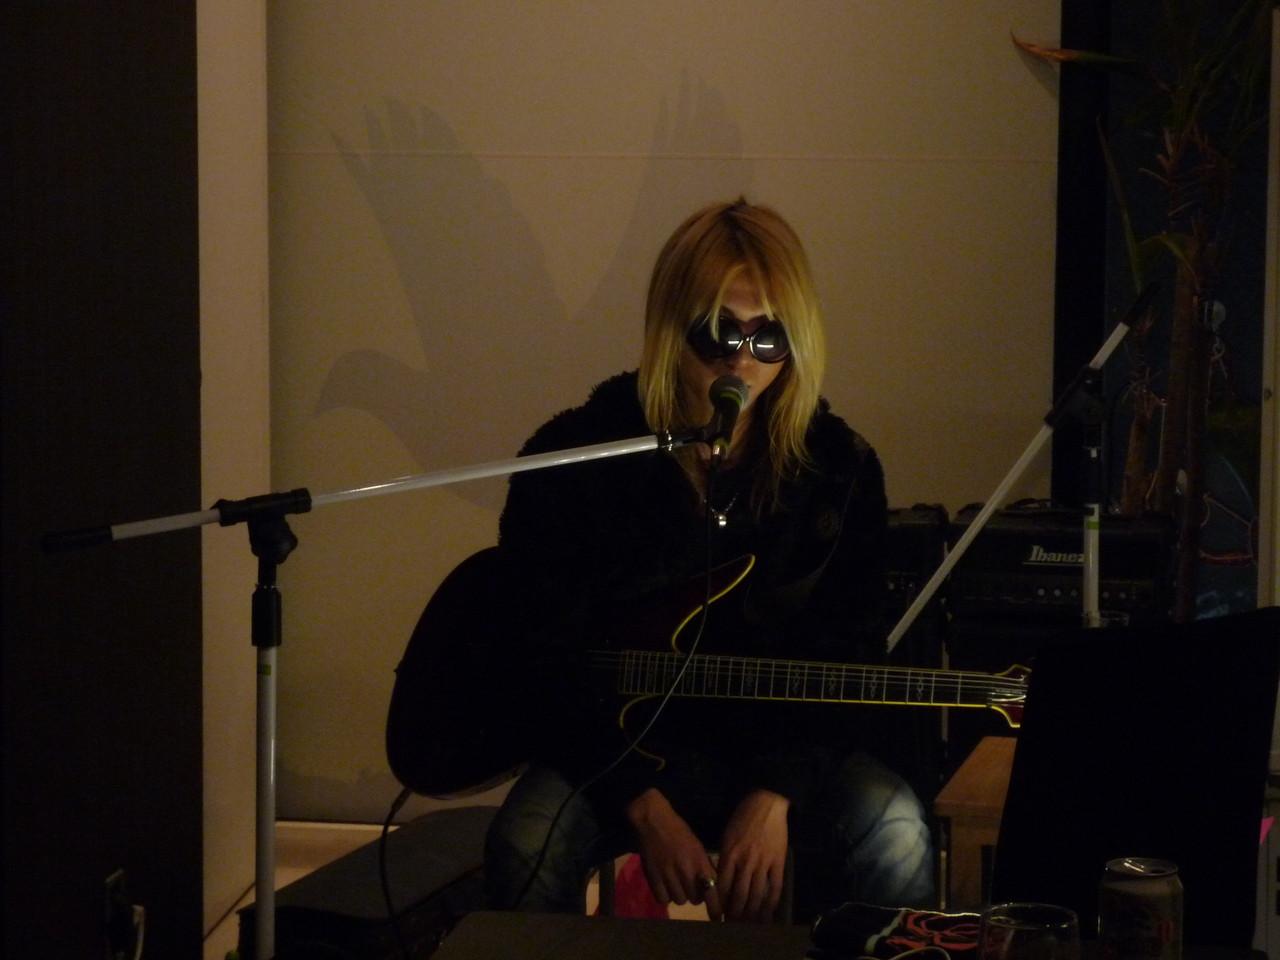 Akitoさんの初ソロ弾き語り♪ 素晴らしい歌声と演奏で最高に盛り上がりました!